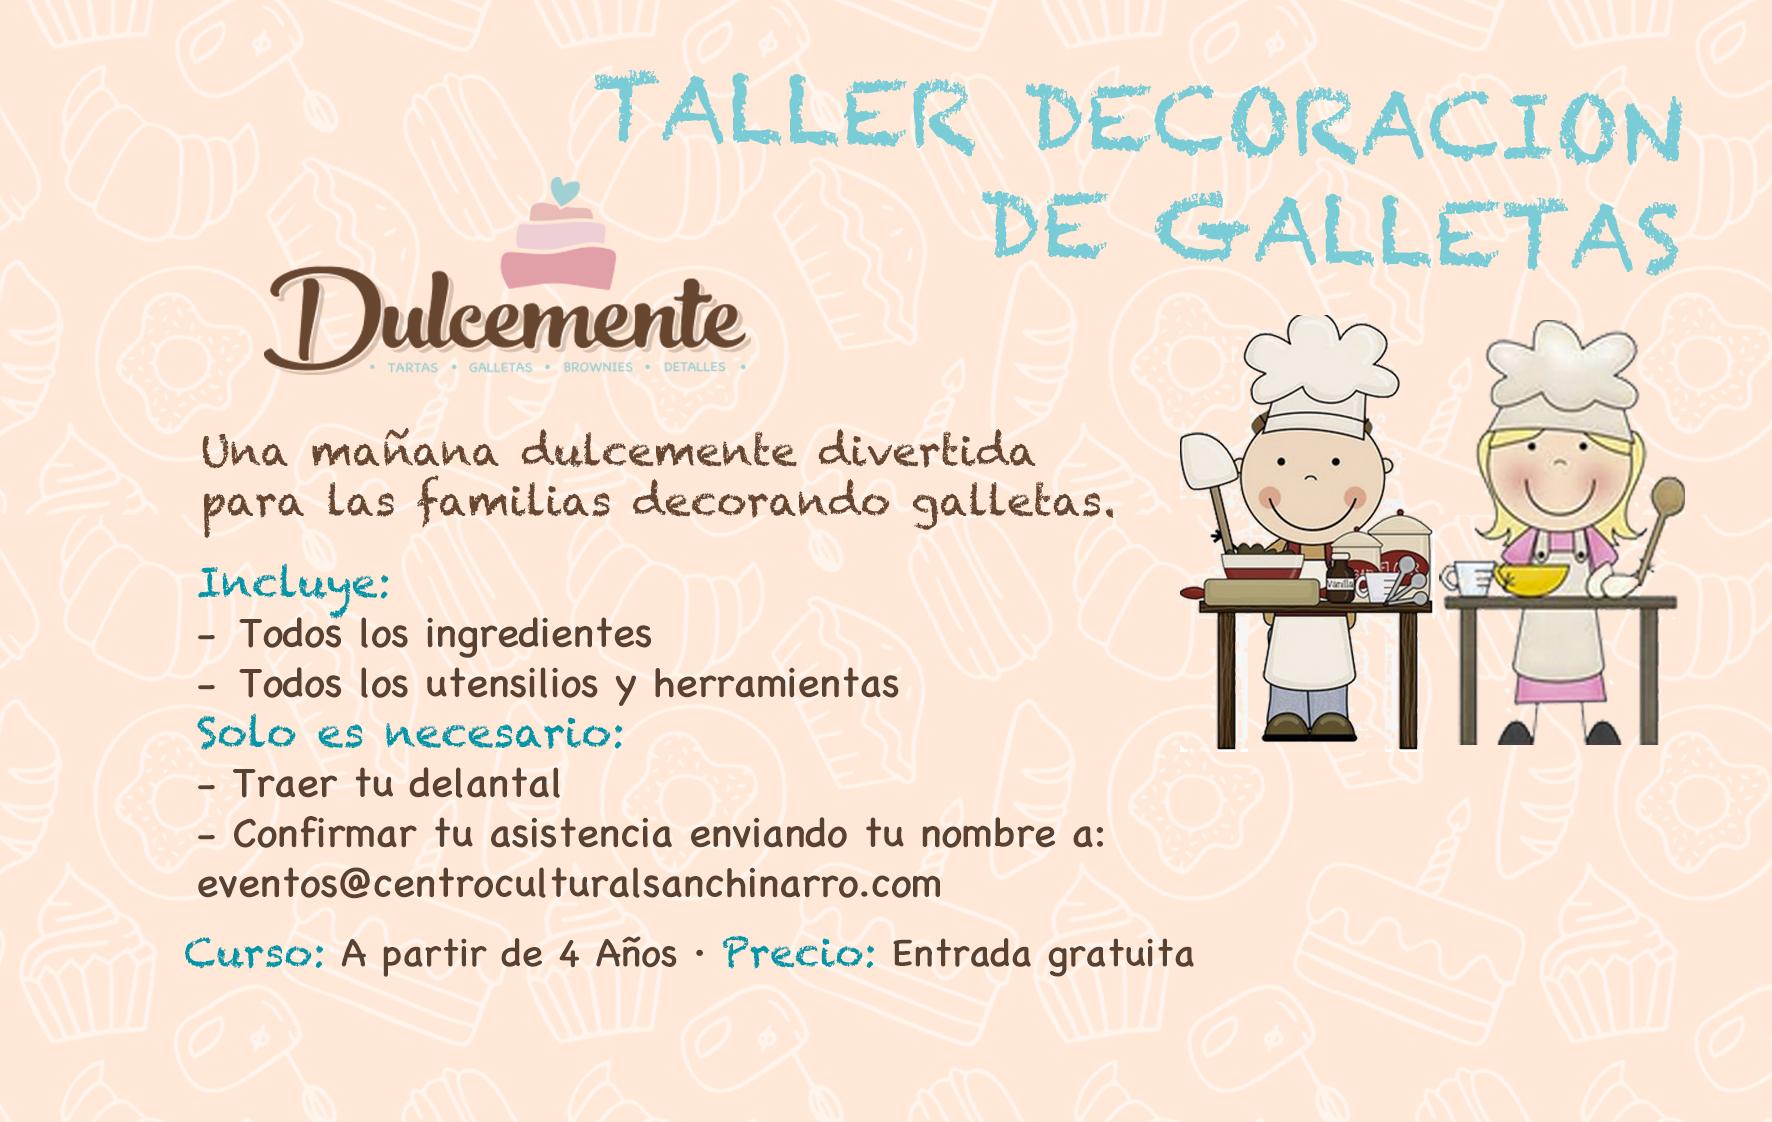 TALLER DE DECORACIÓN DE GALLETAS